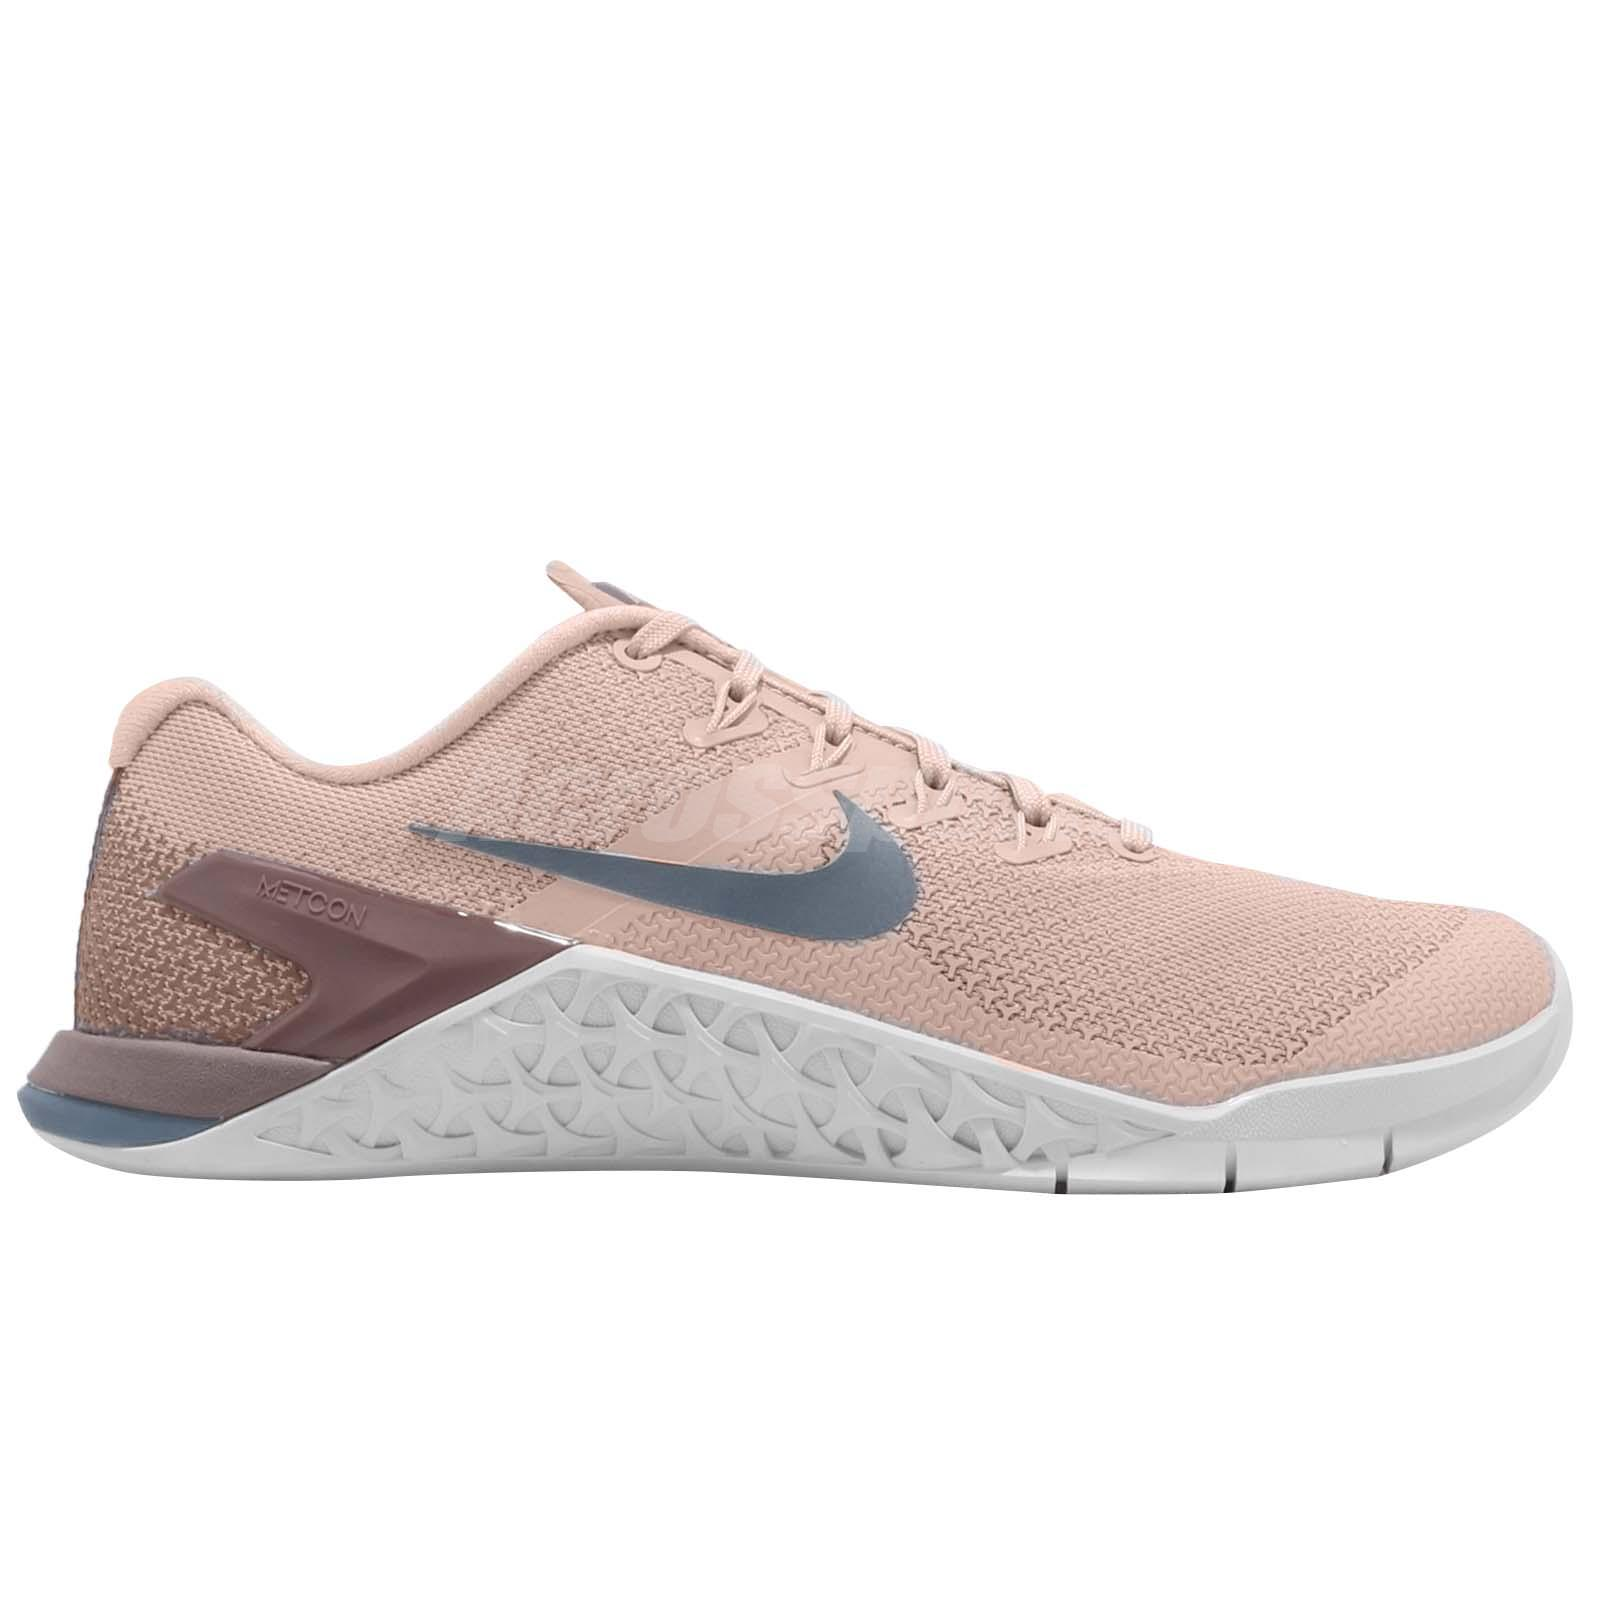 Teal Crossfit Gym Training Nike METCON 4 UK 5.5 EU 39 Particle Beige